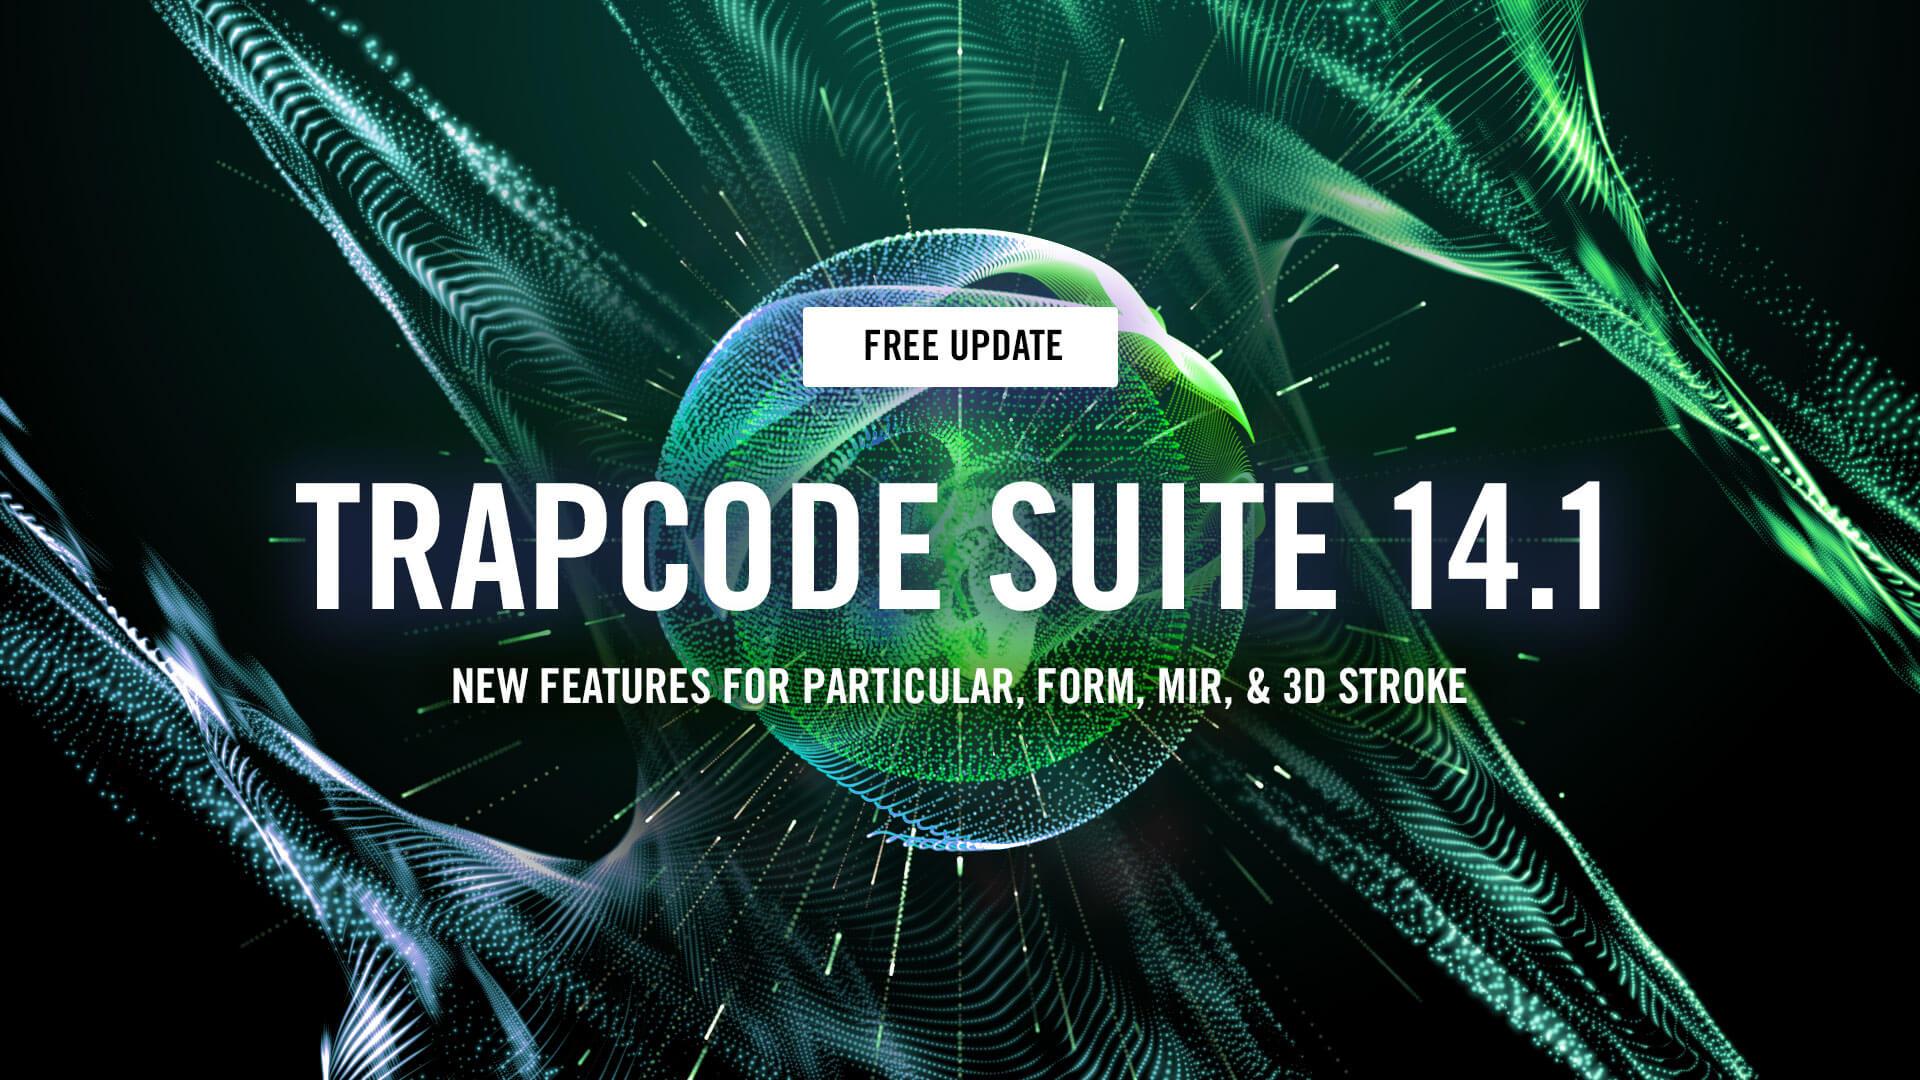 Red Giant Trapcode Suite 15.1.3 – AE必装插件红巨星粒子套装插图(1)